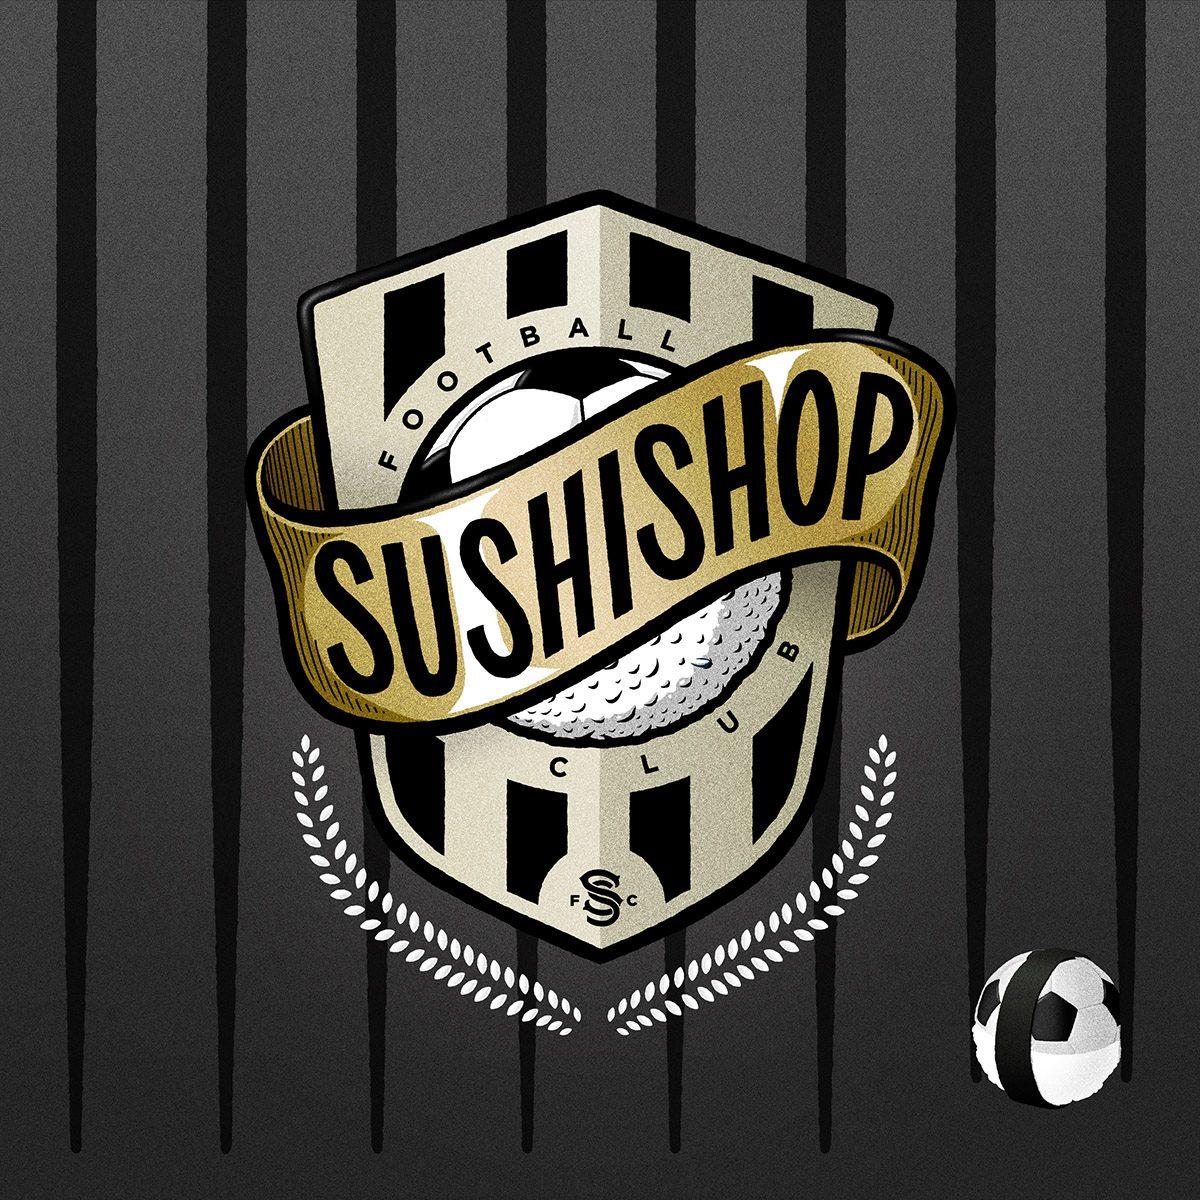 01_COVER_SUSHISHOP